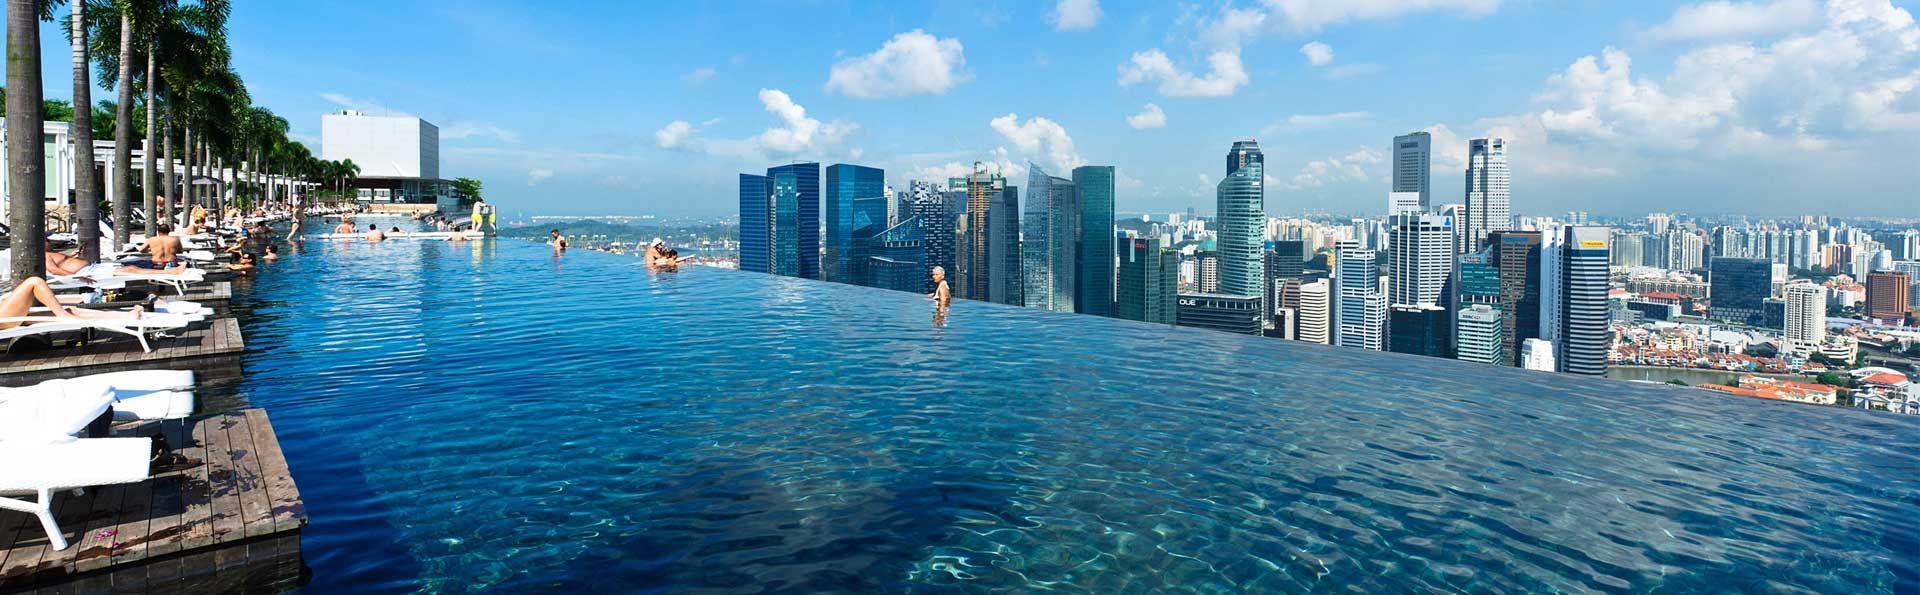 Singapore Marina Bay Sands Infinity Rooftop Pool